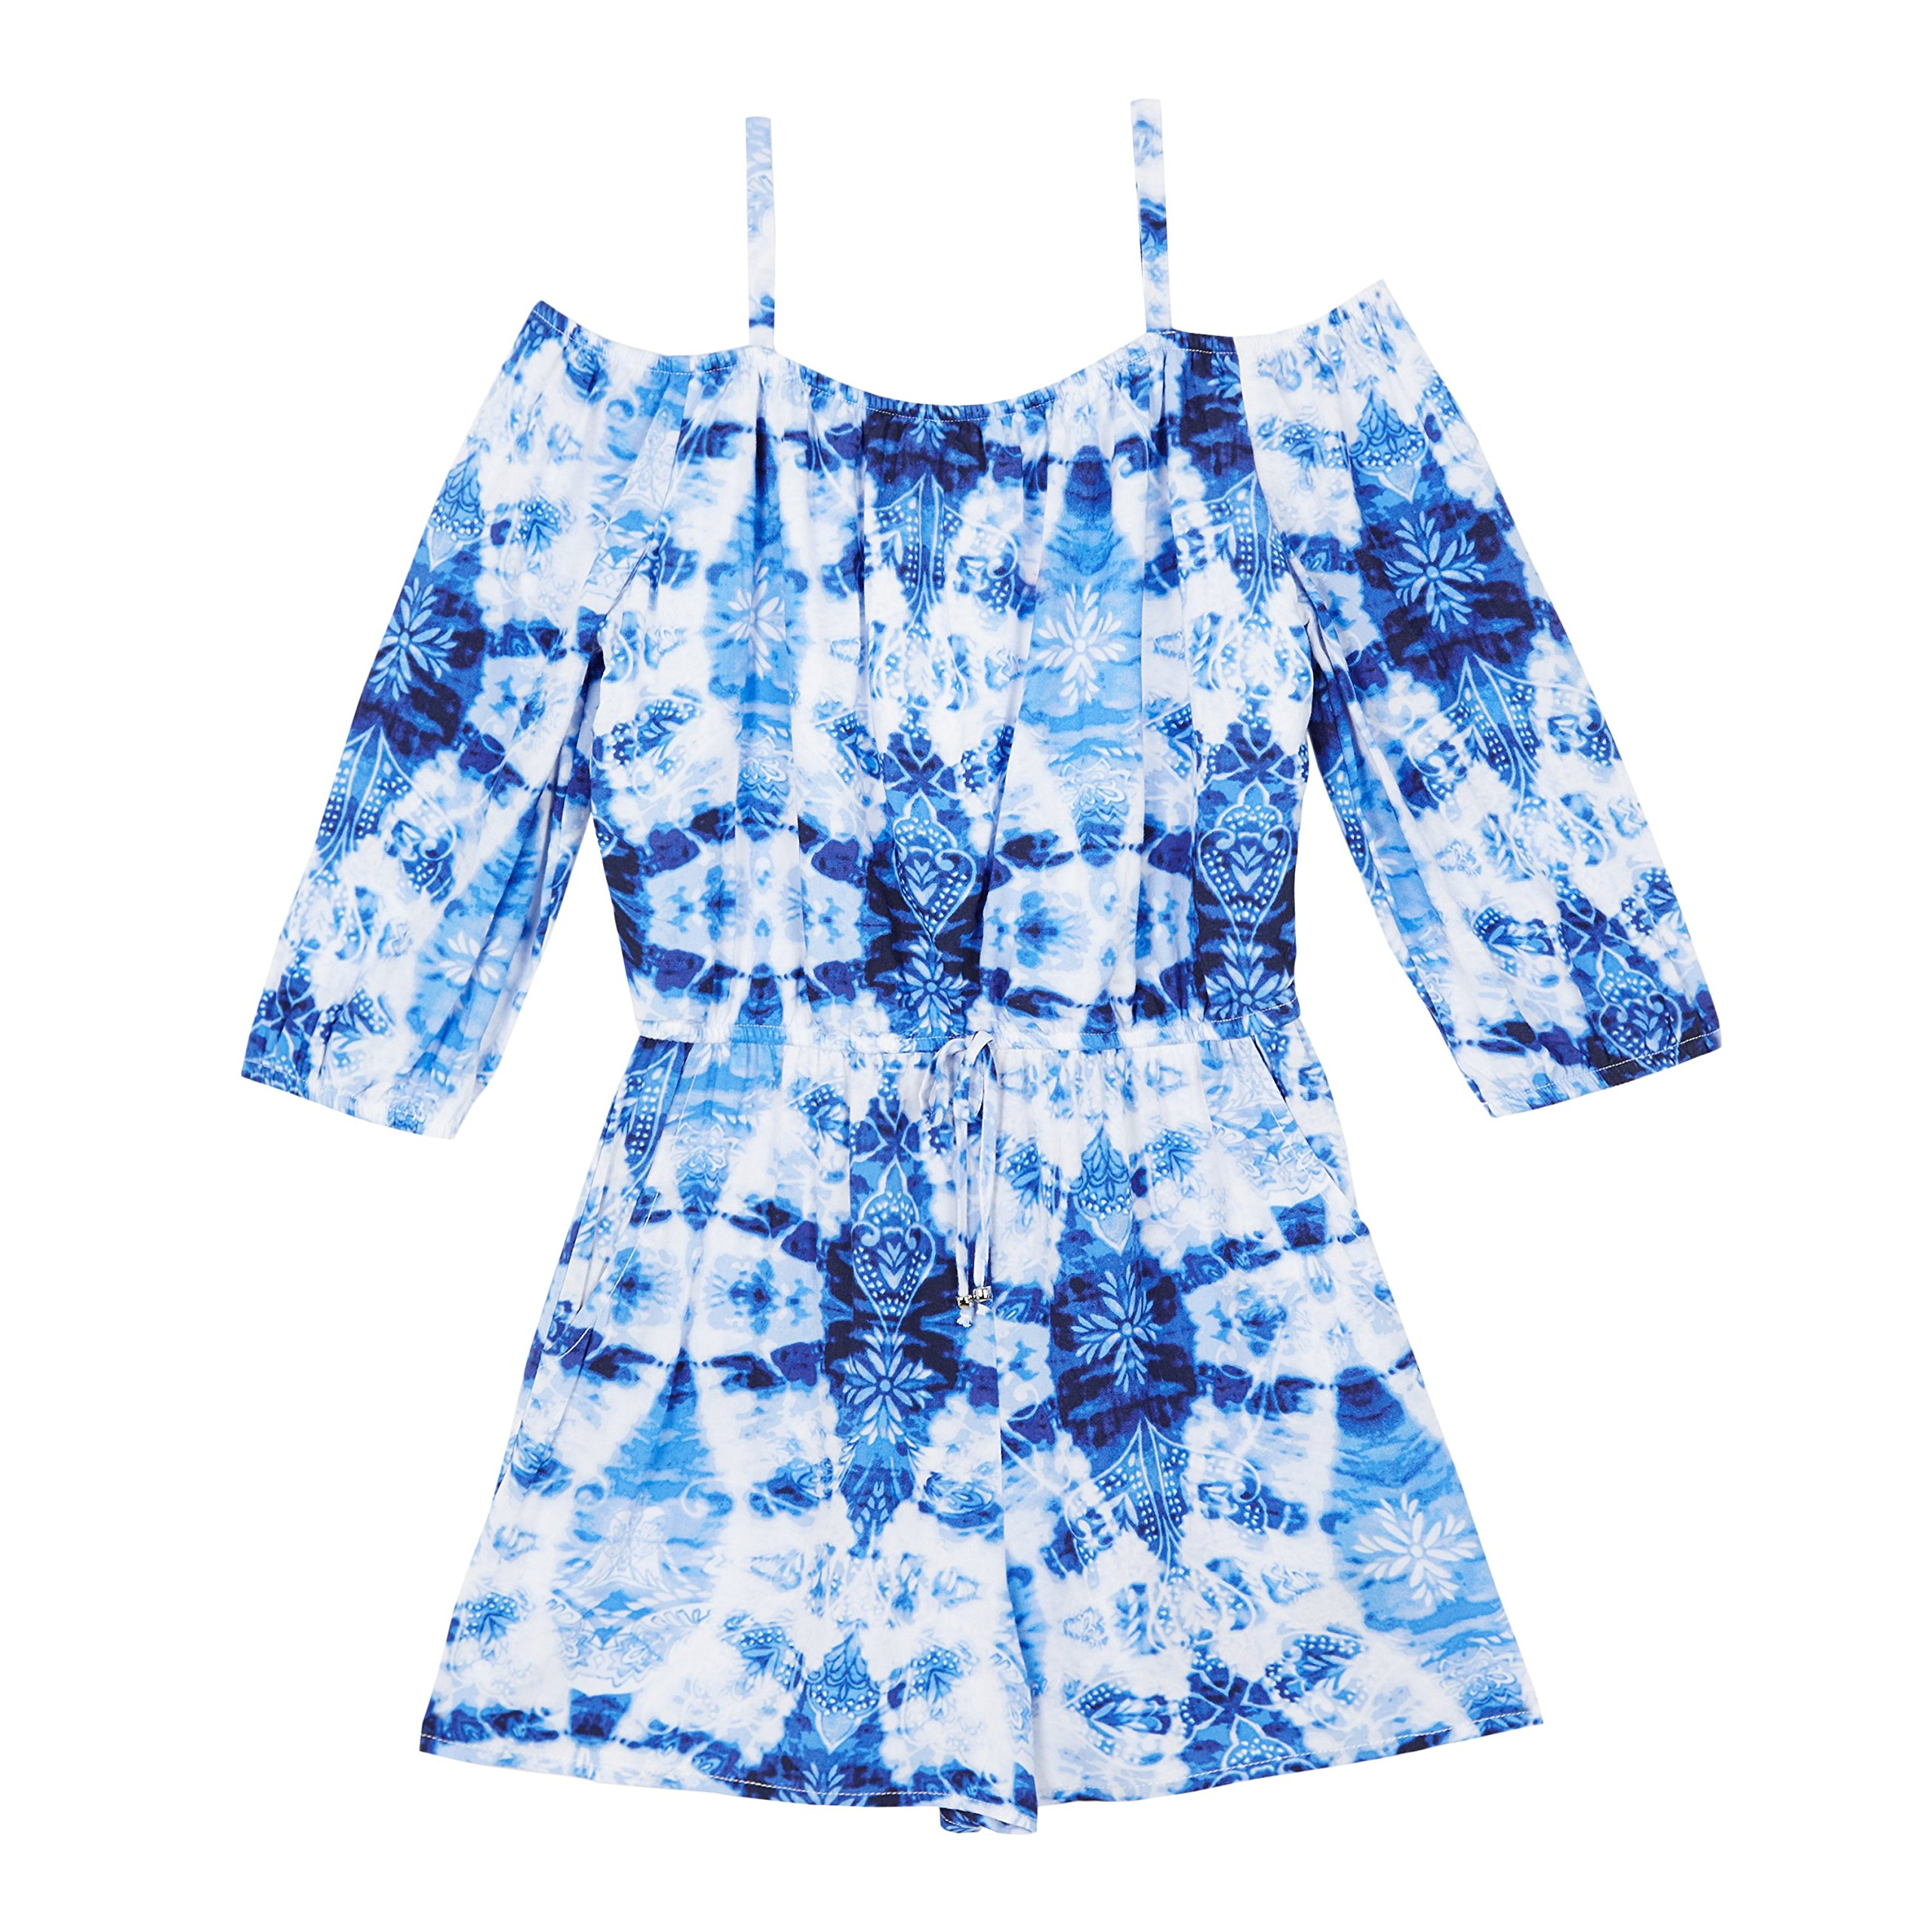 Amy Byer Big Girls' Off The Shoulder Romper, Cobalt Tie Dye Navy Paisley, L